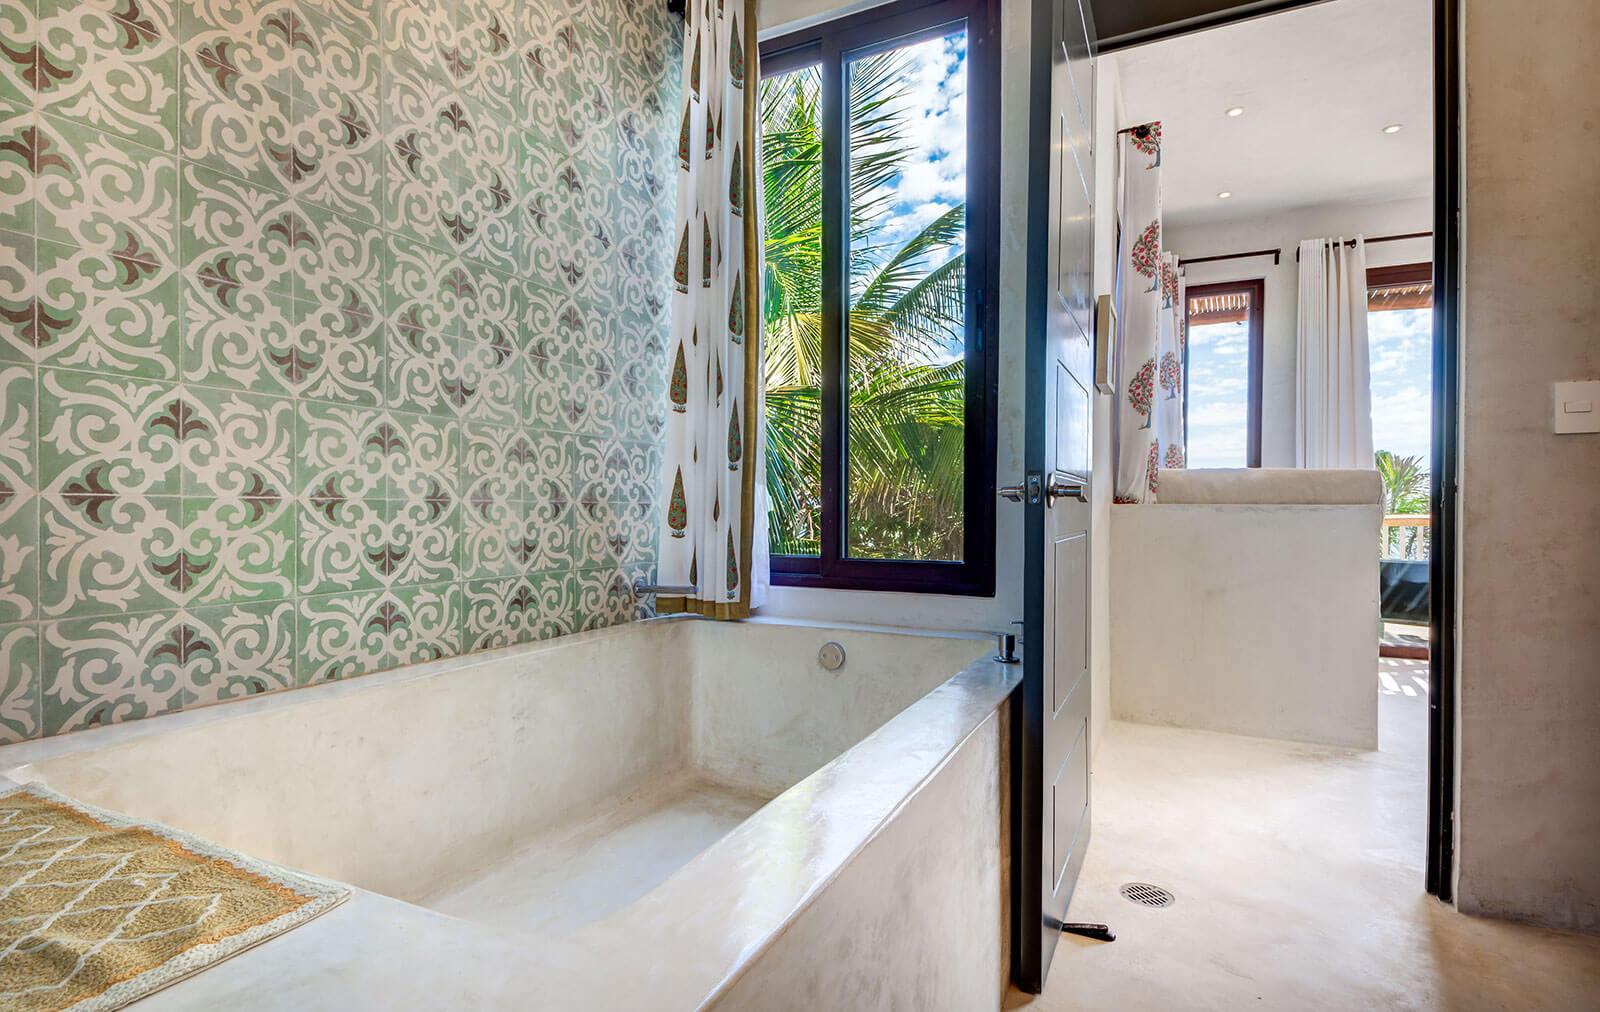 Maya_Luxe_Riviera_Maya_Luxury_Villas_Experiences_Tulum_Soliman_Bay_5_Bedrooms_29.jpg